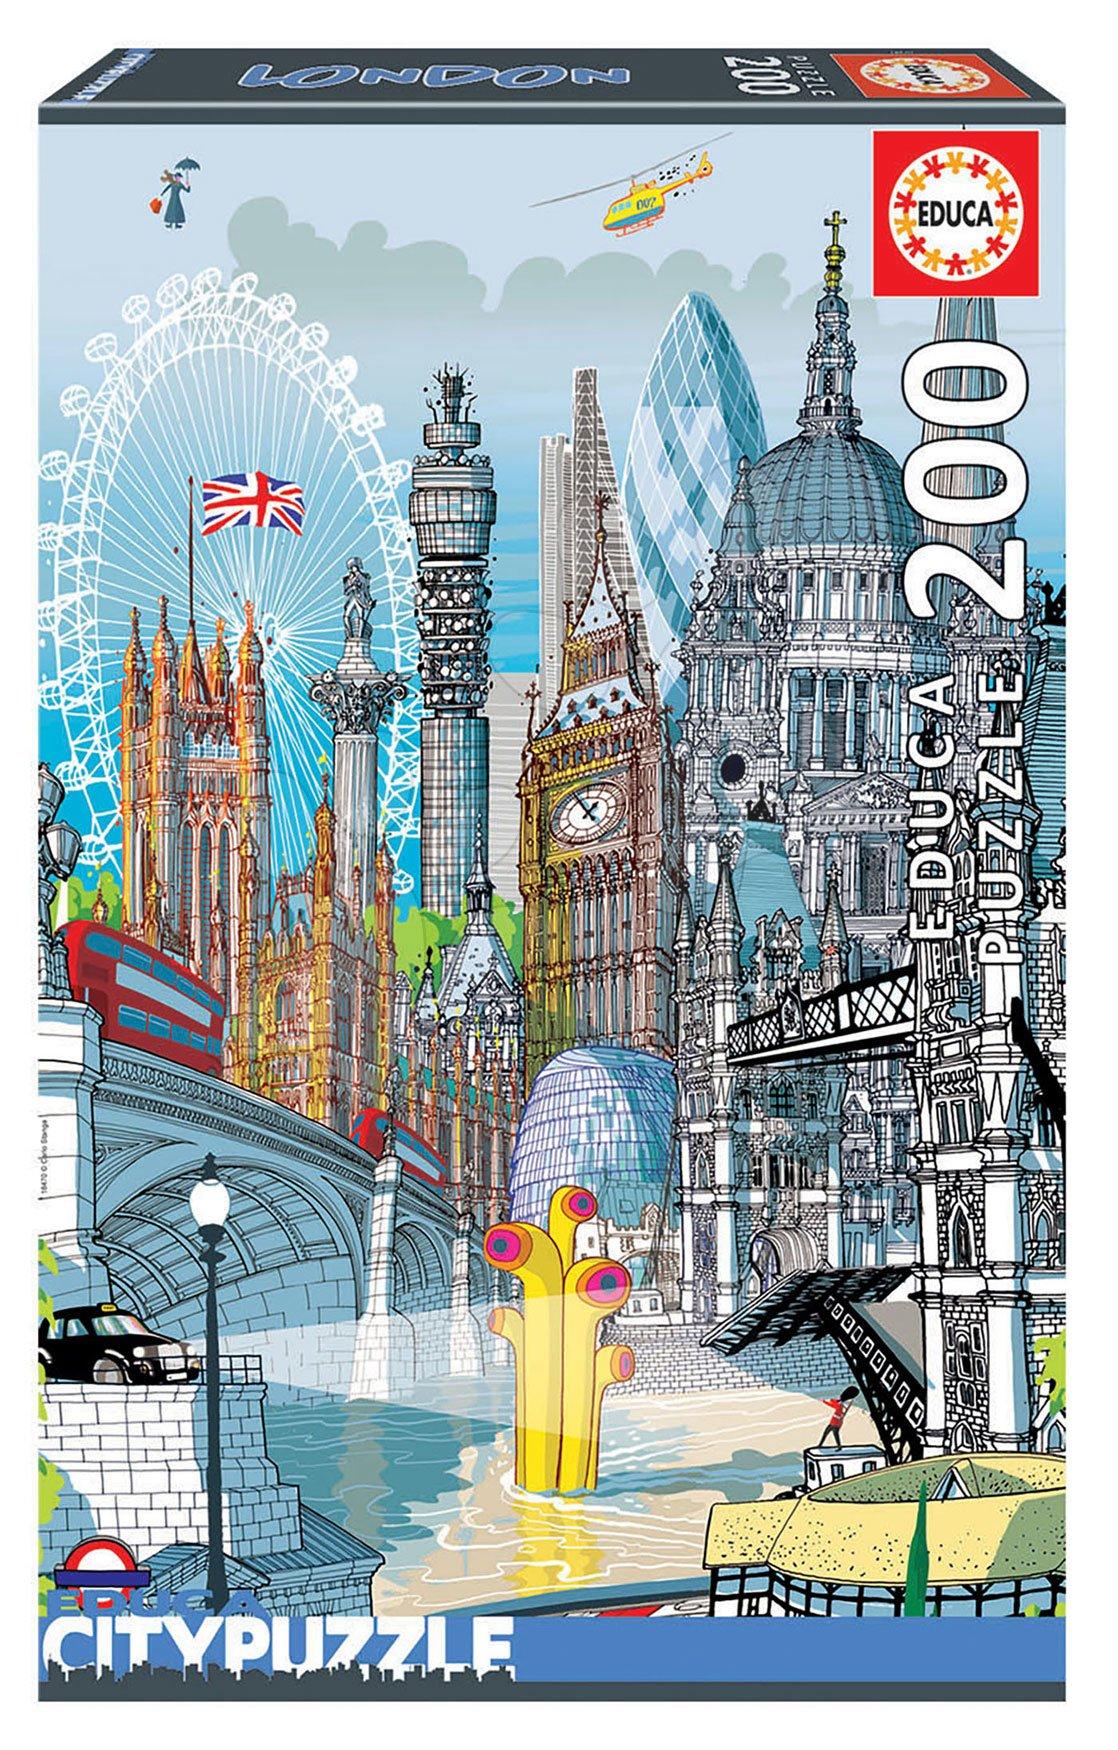 Puzzle London Citypuzzles Carlo Stanga Educa 200 dílků – ilustrátor od 8 let